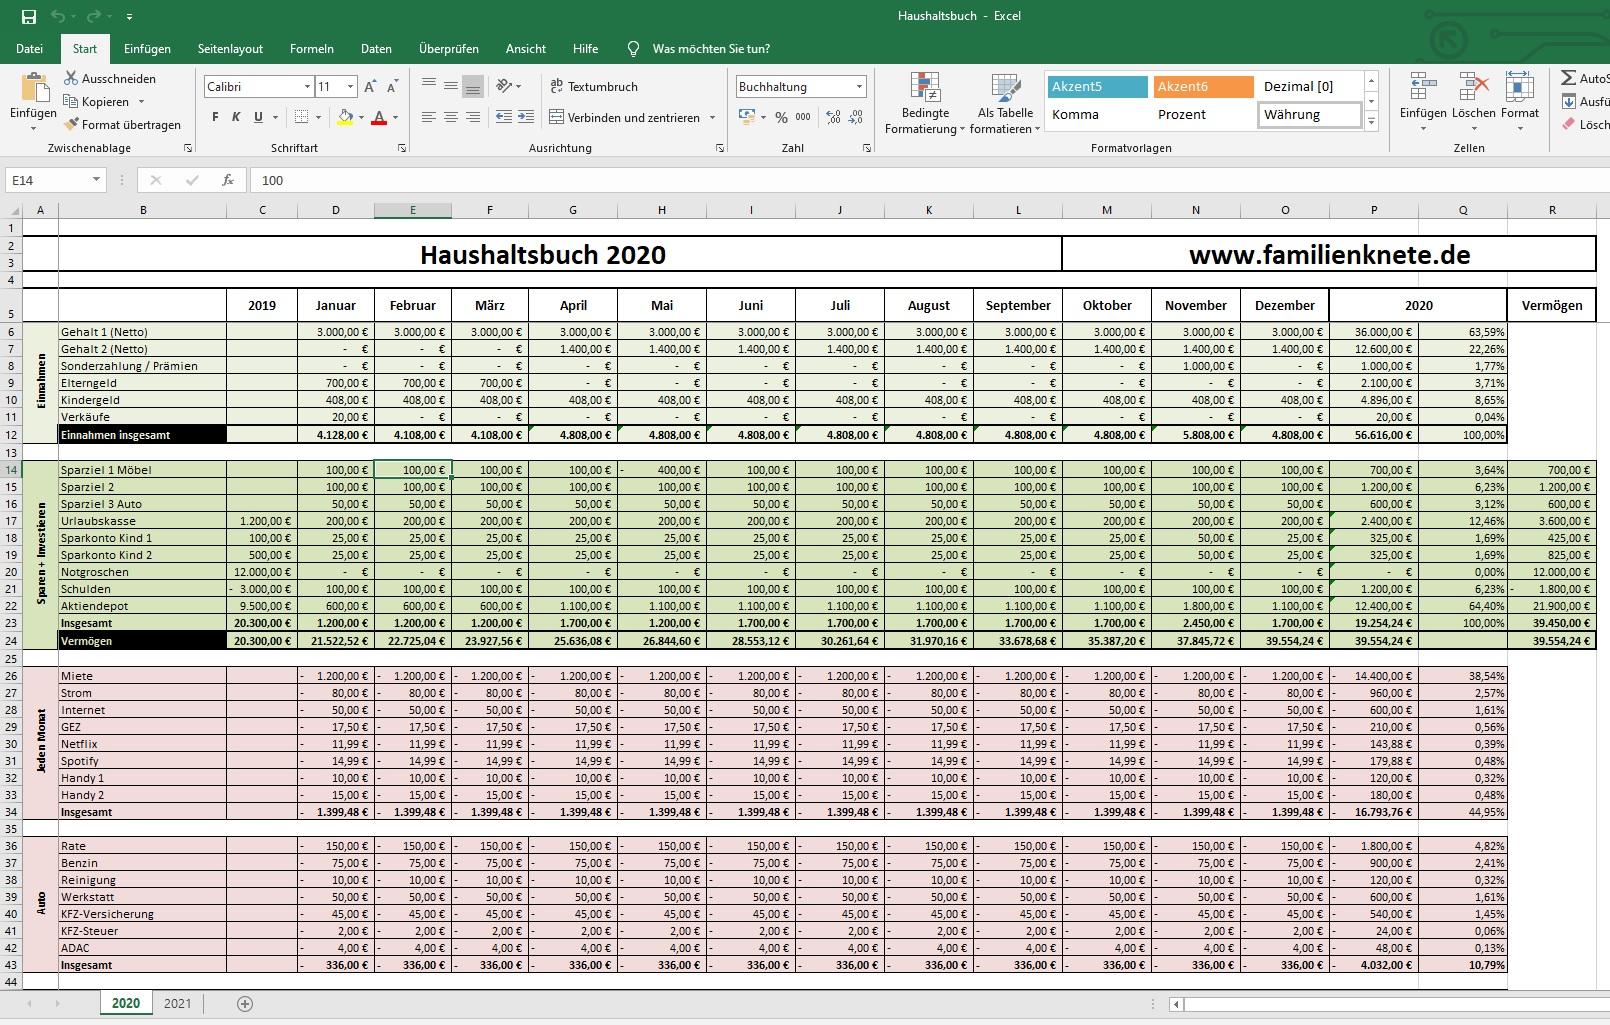 Kostenloses Haushaltsbuch Excel Vorlage Fur Familien Familienknete